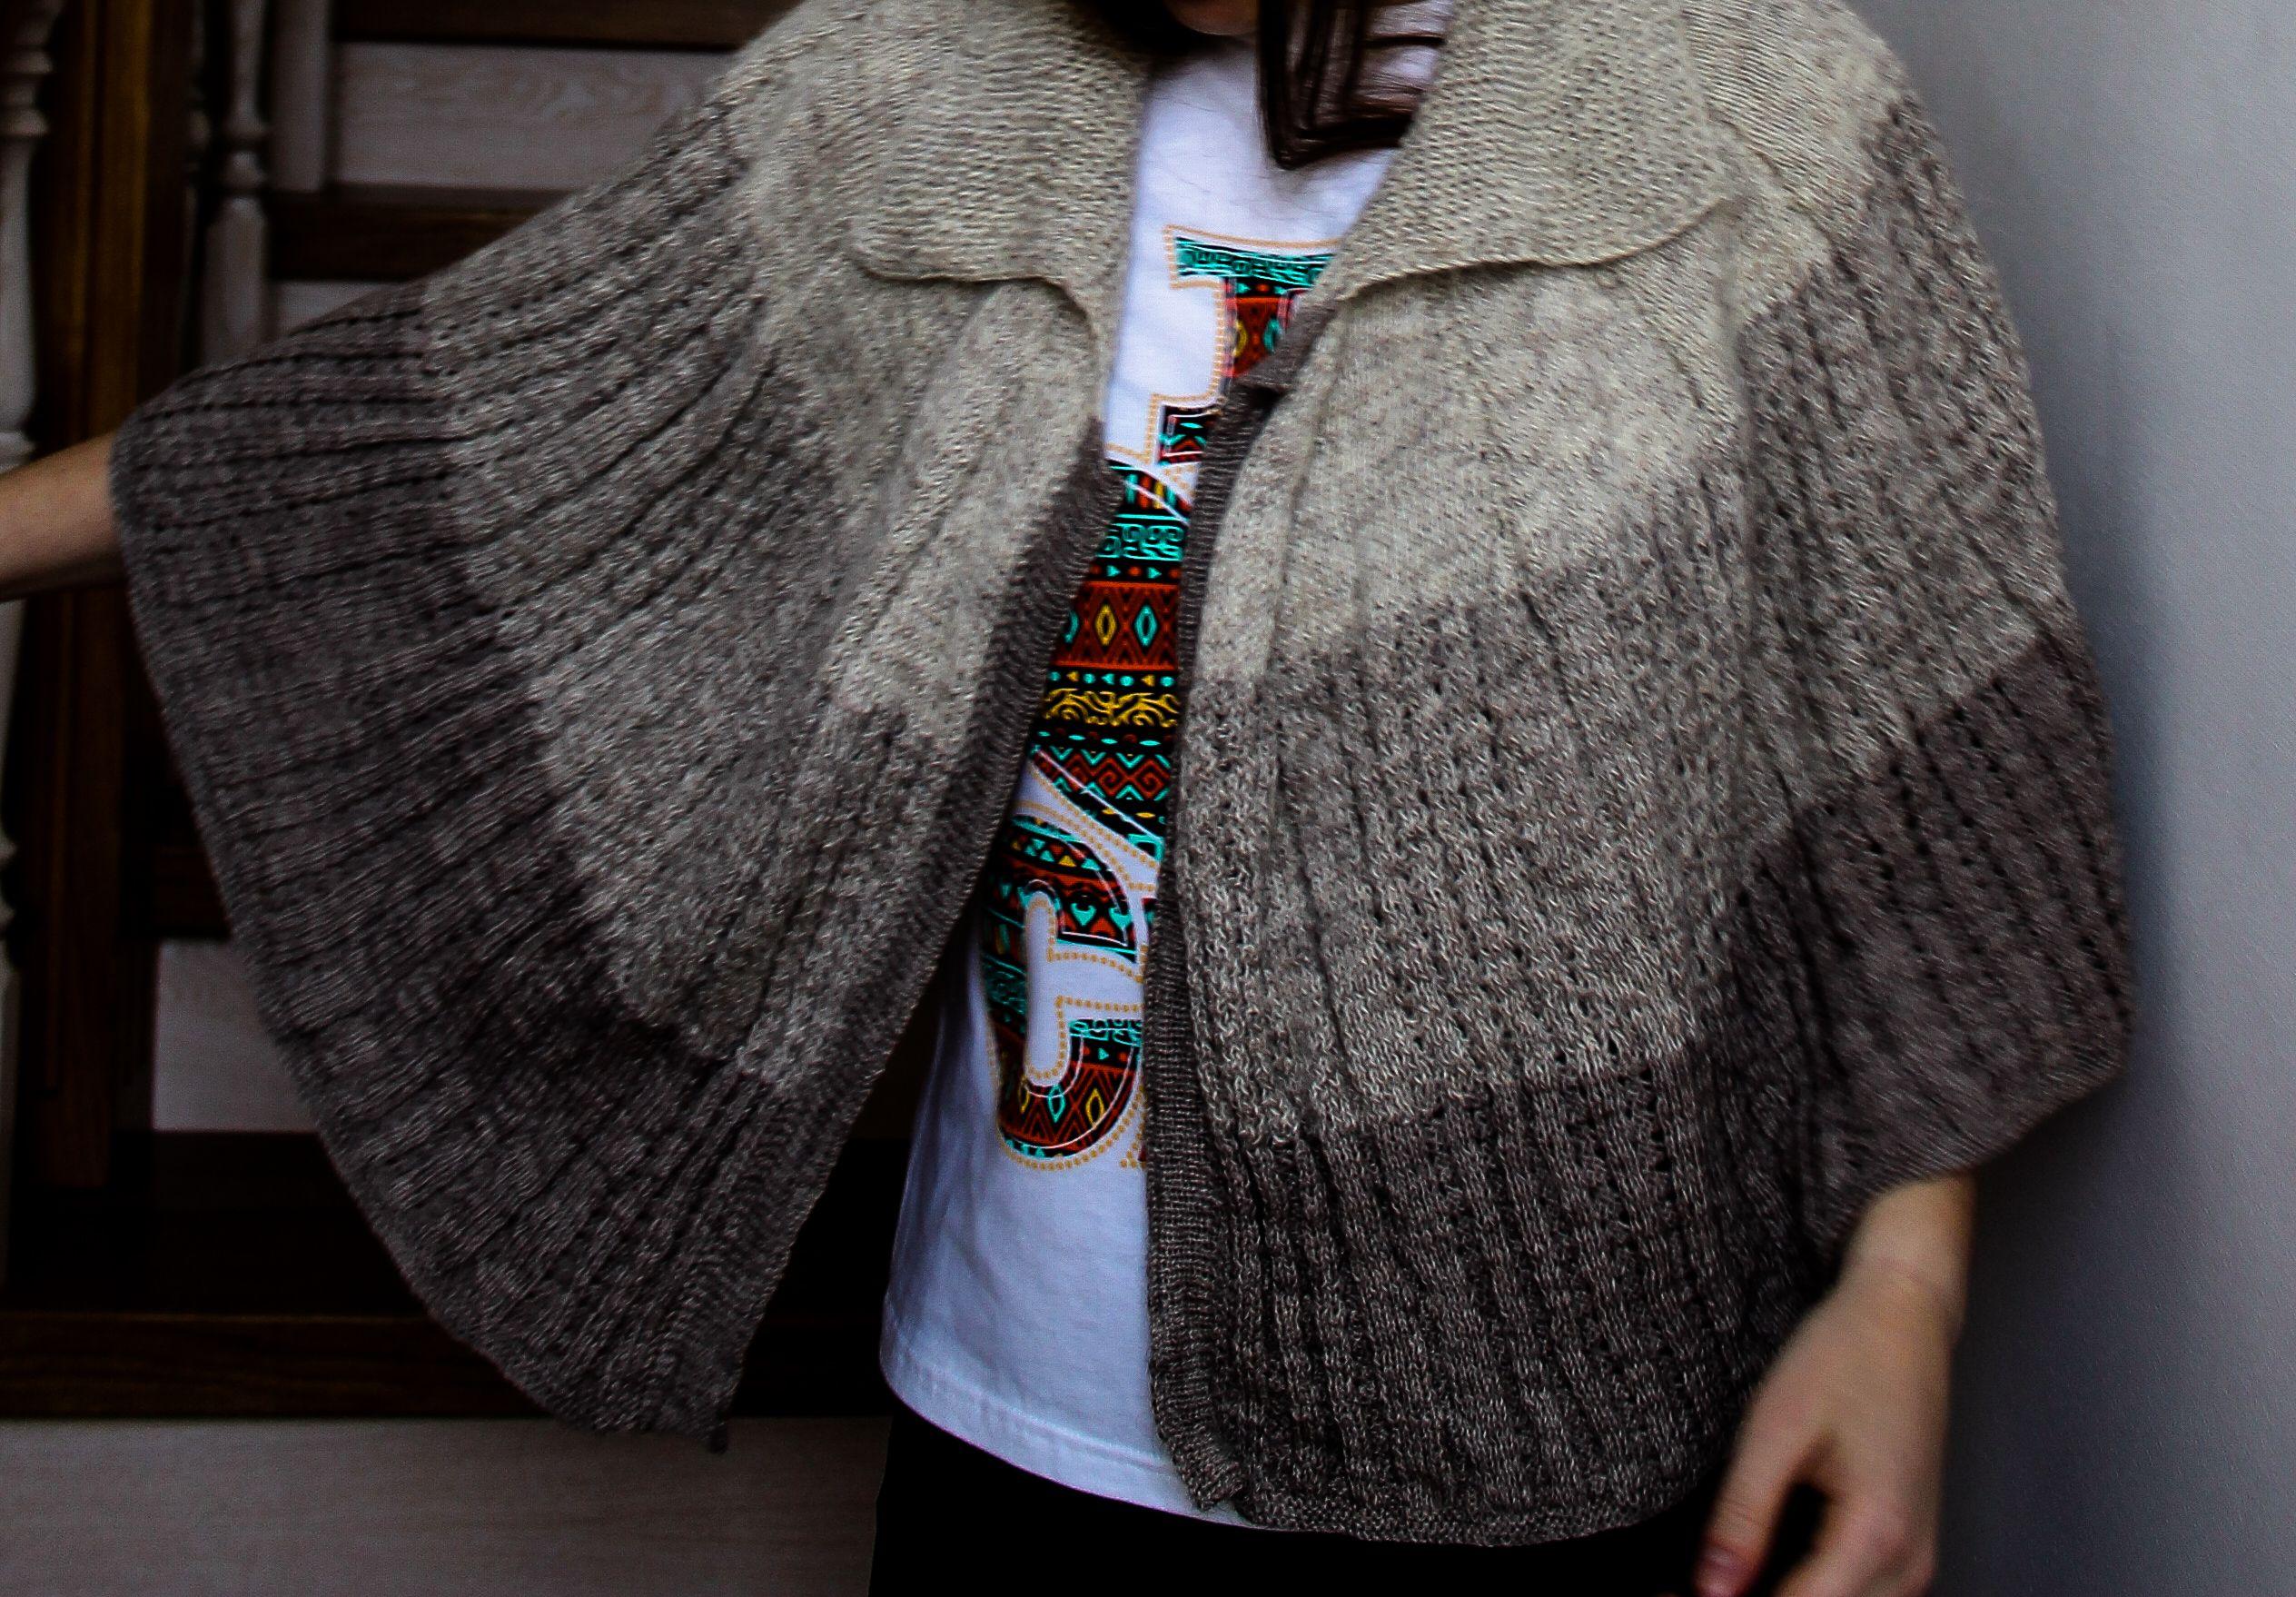 cardigan dress зиму original вязаная одежда серый handmade knitting knitted cape плечи для накидка ручная работа вязка женщин пончо knit